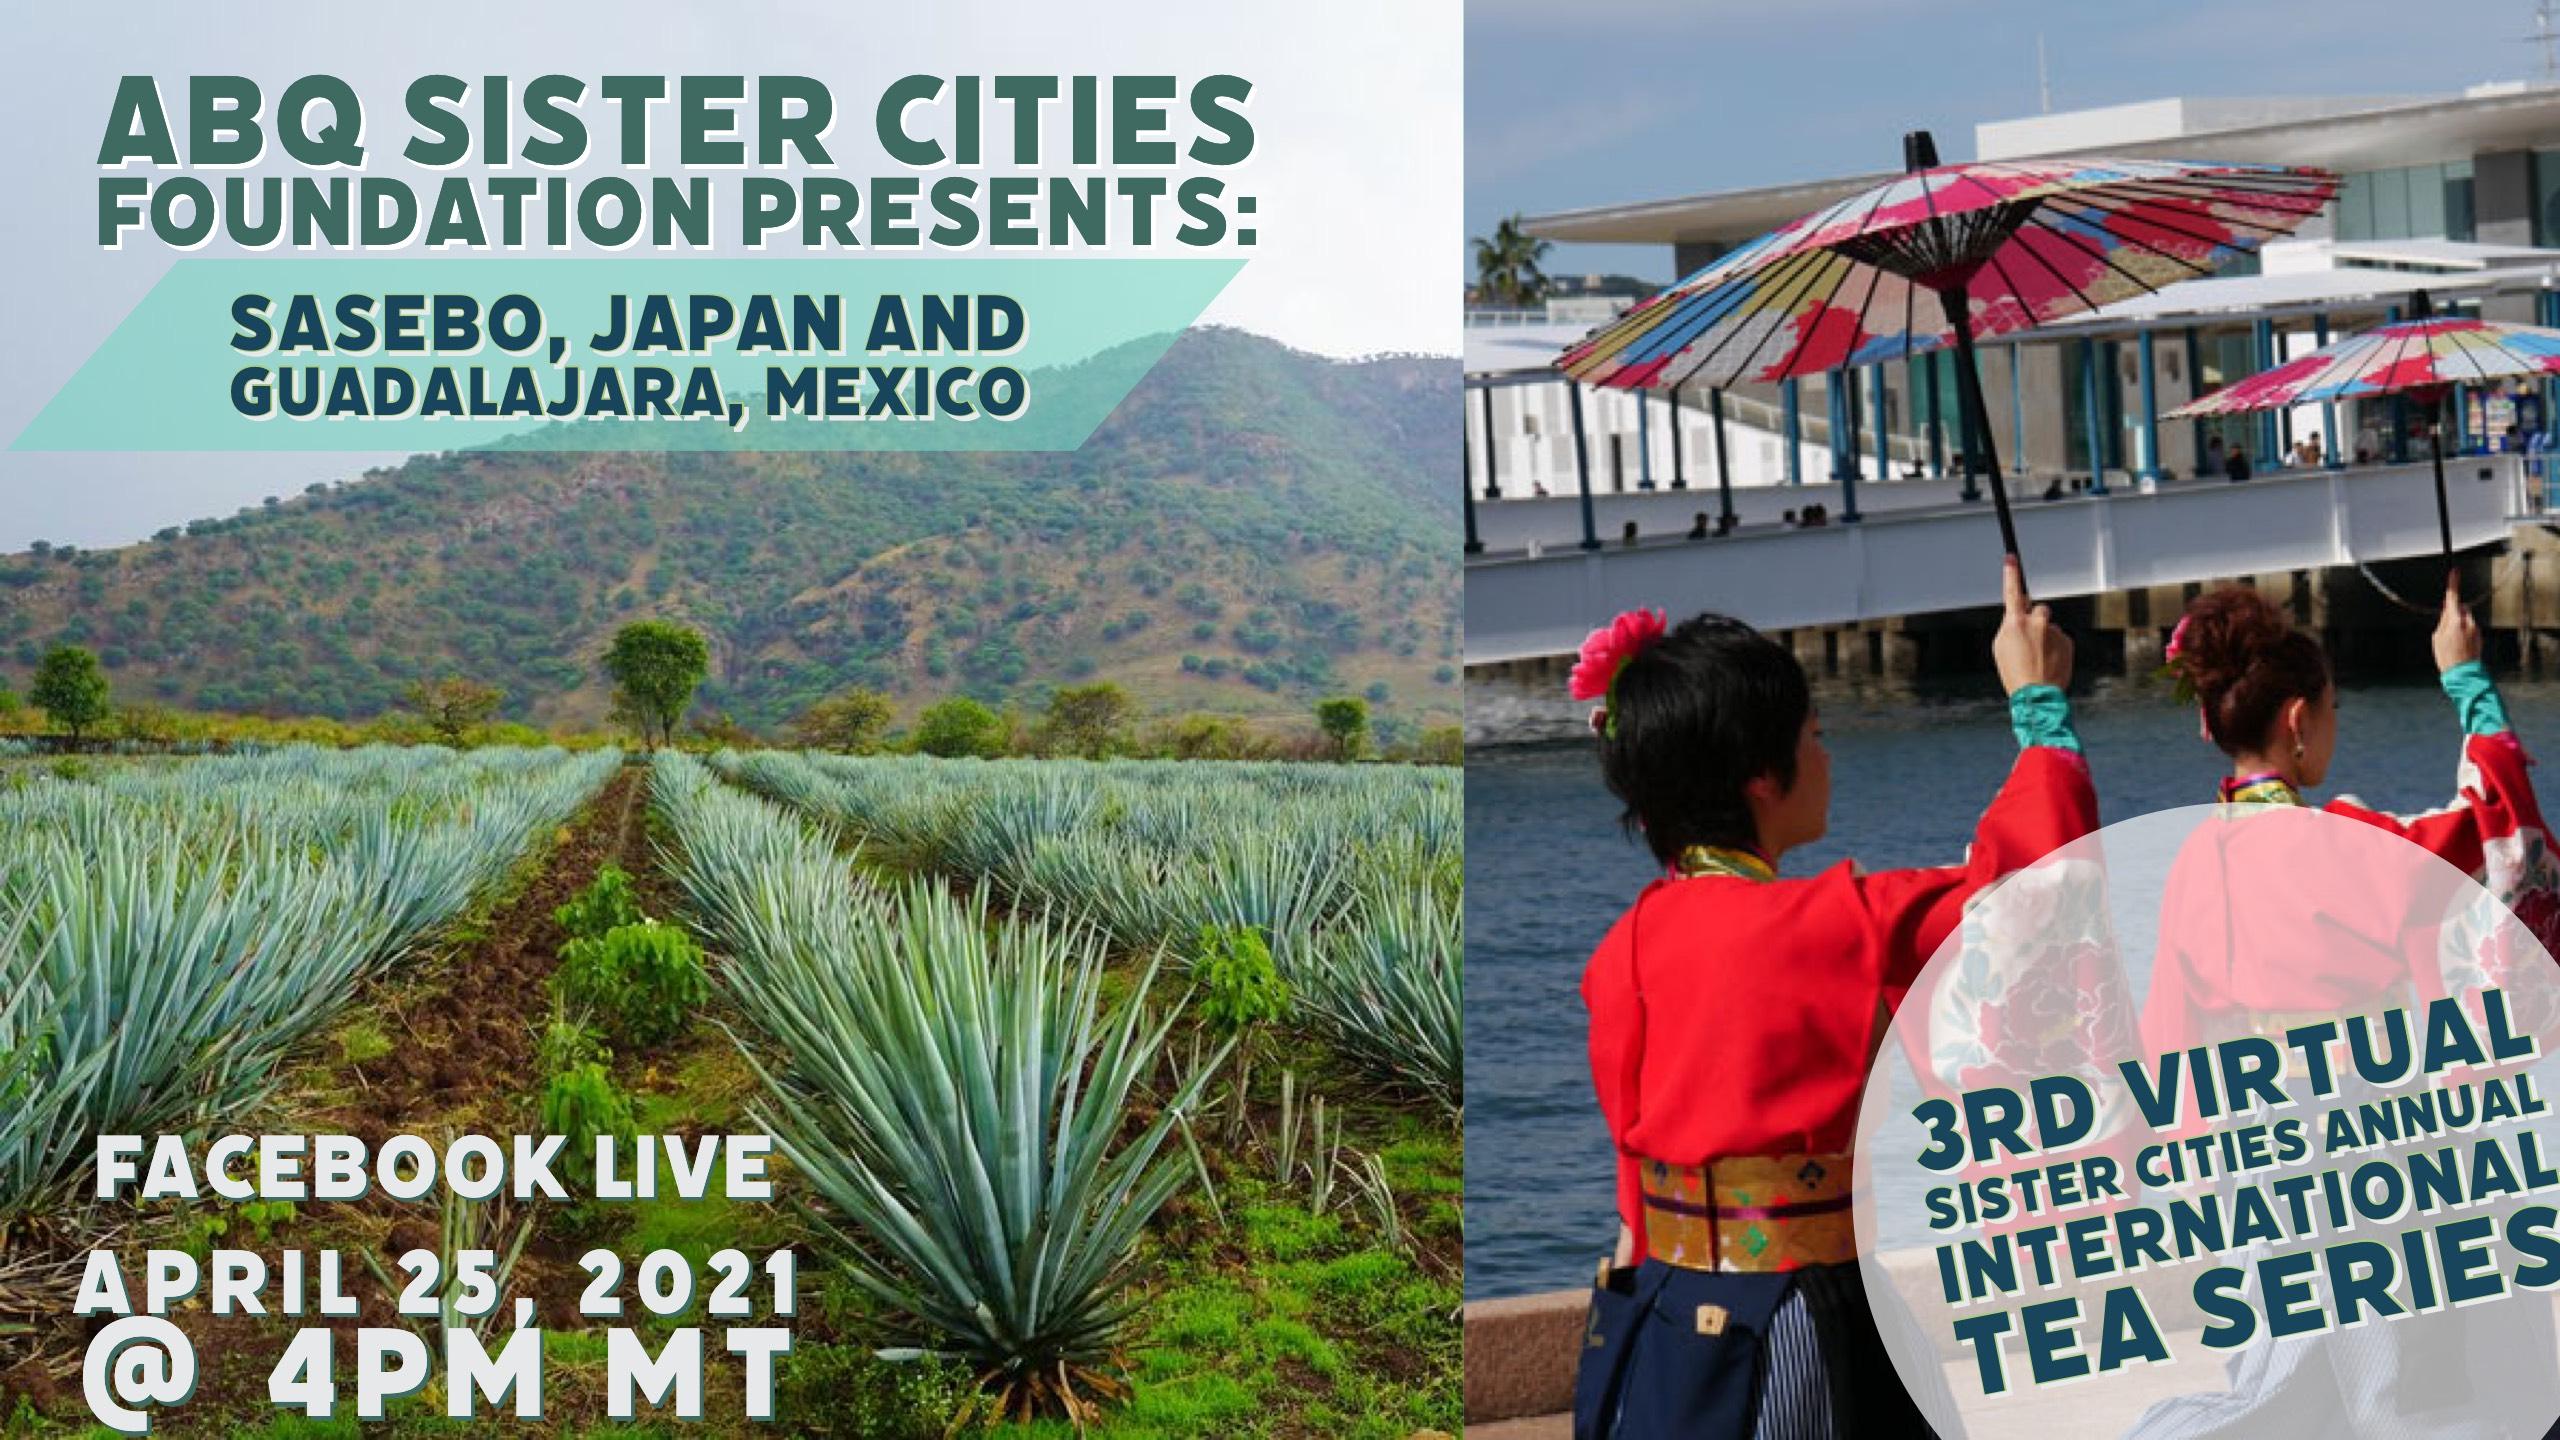 3rd Virtual Sister Cities Annual International Tea